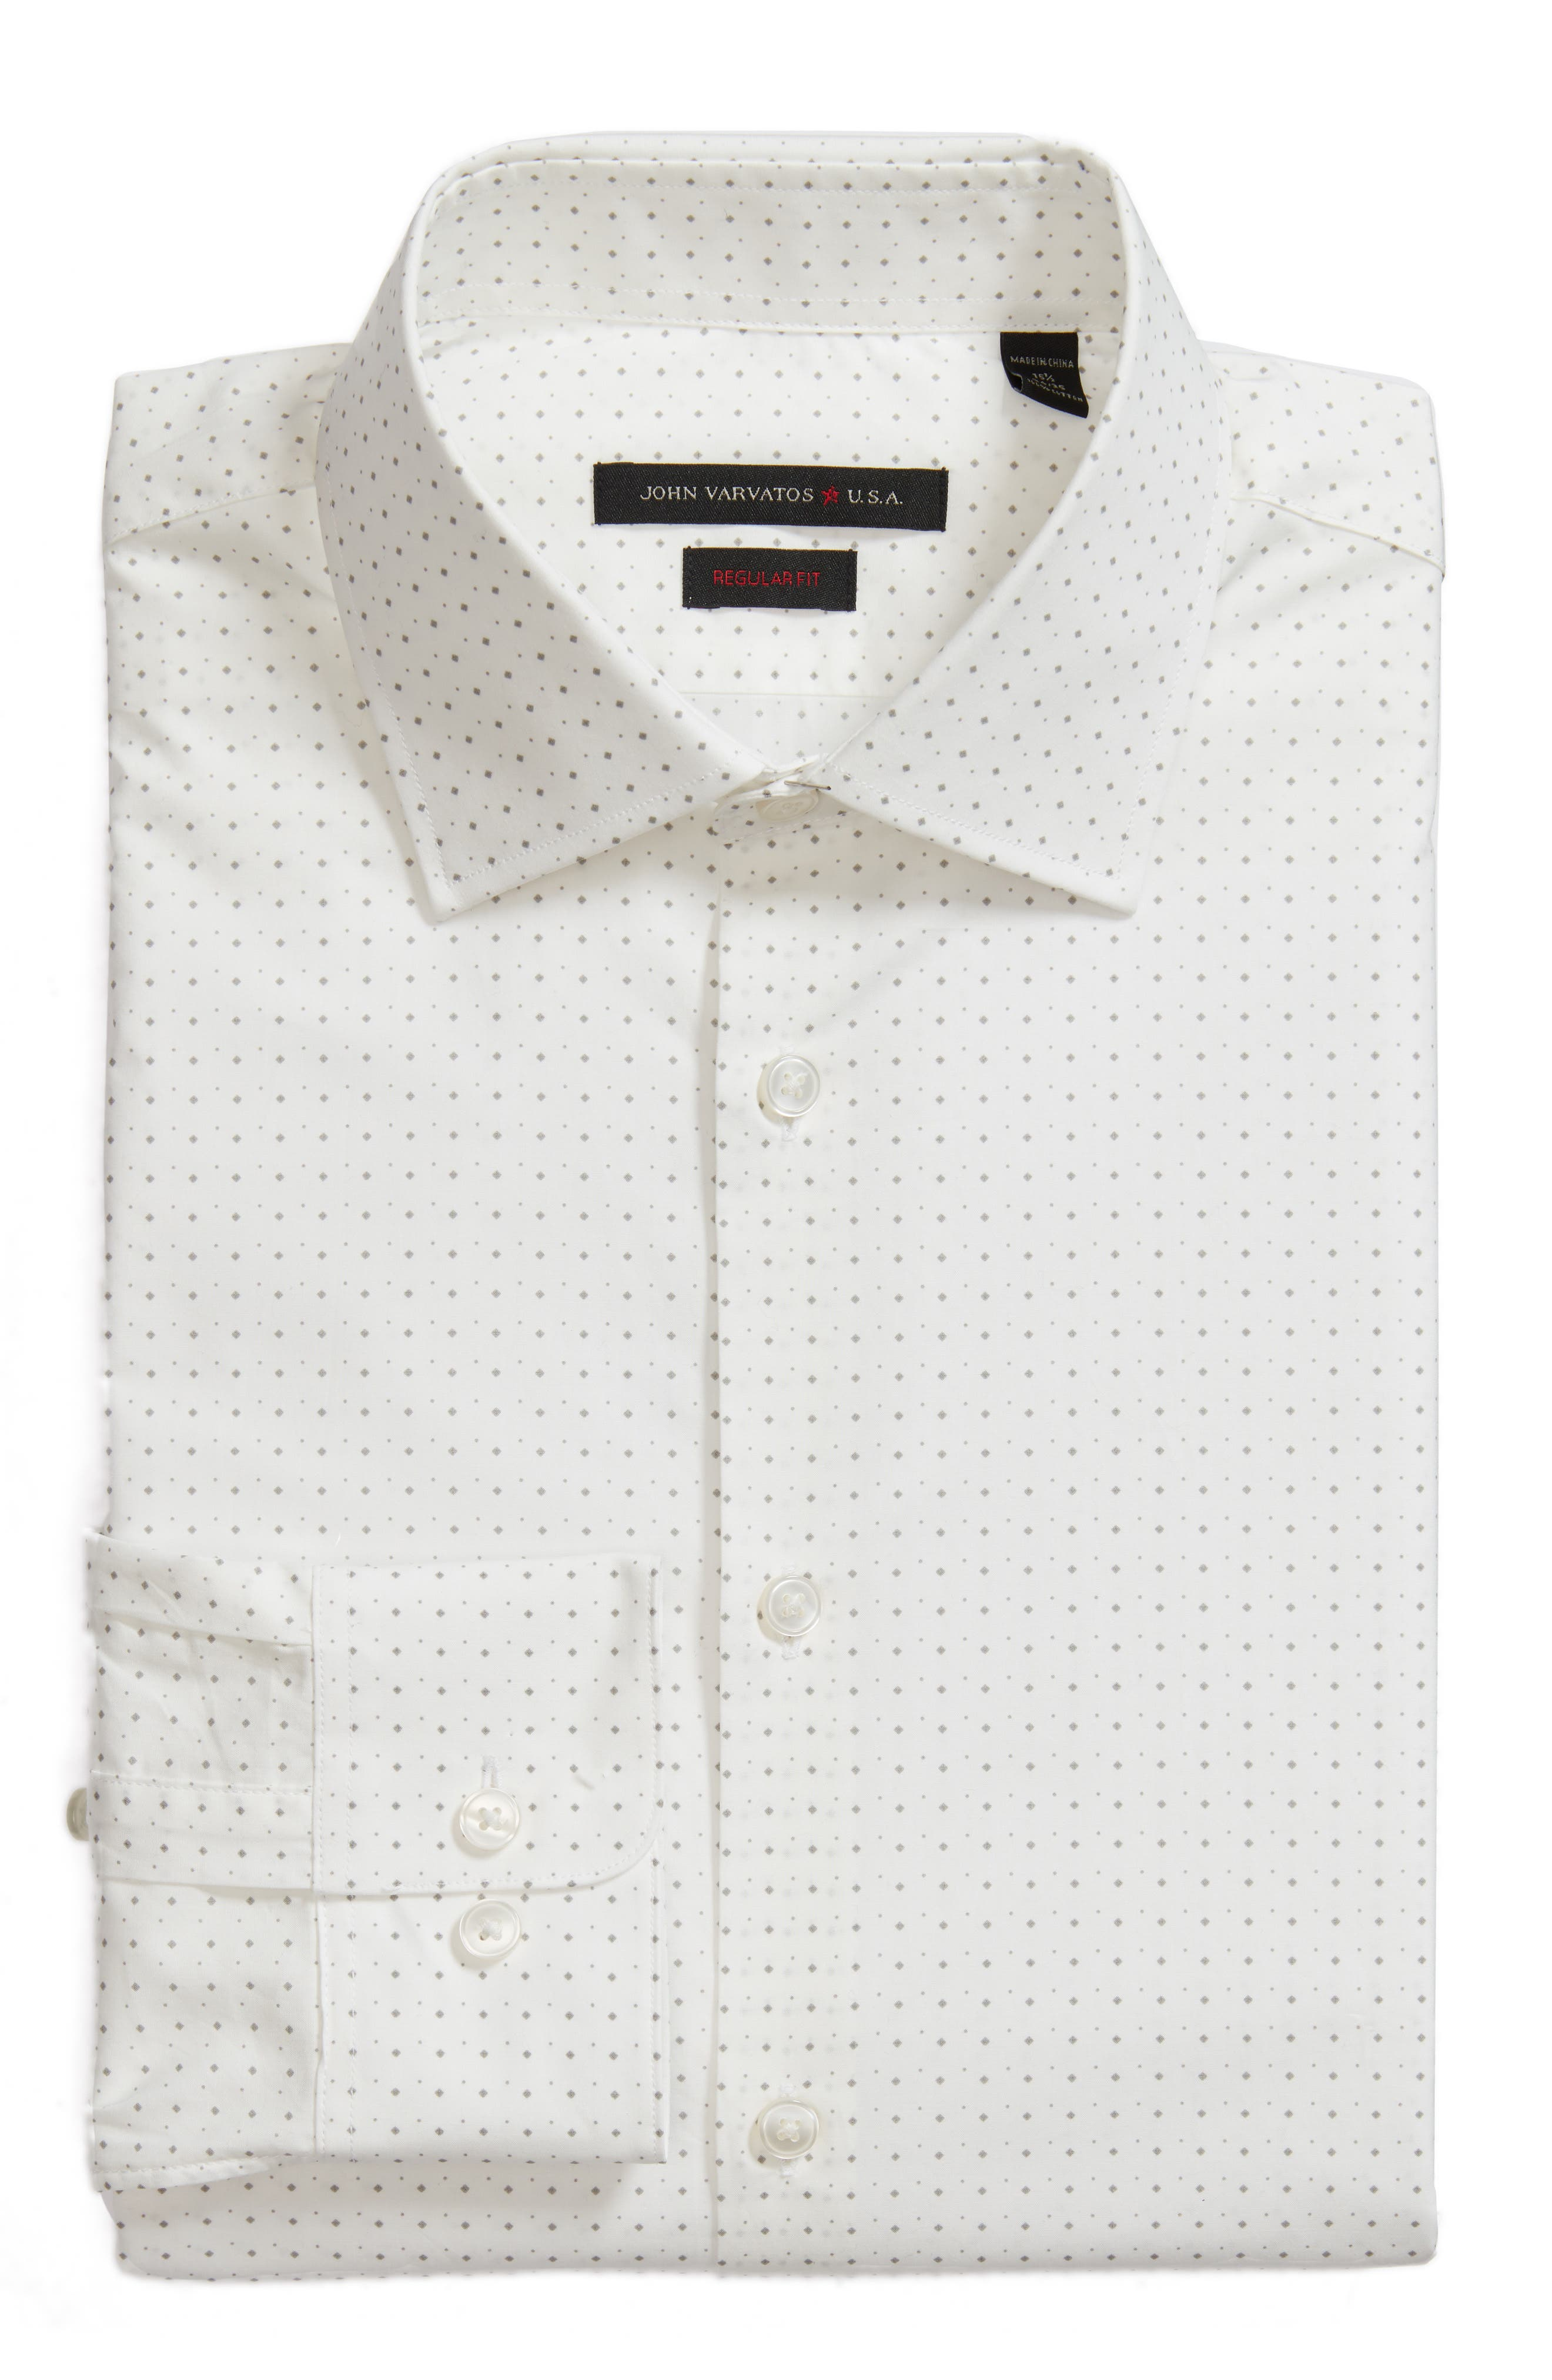 Regular Fit Diamond Dress Shirt,                             Alternate thumbnail 5, color,                             GRIFFIN GREY